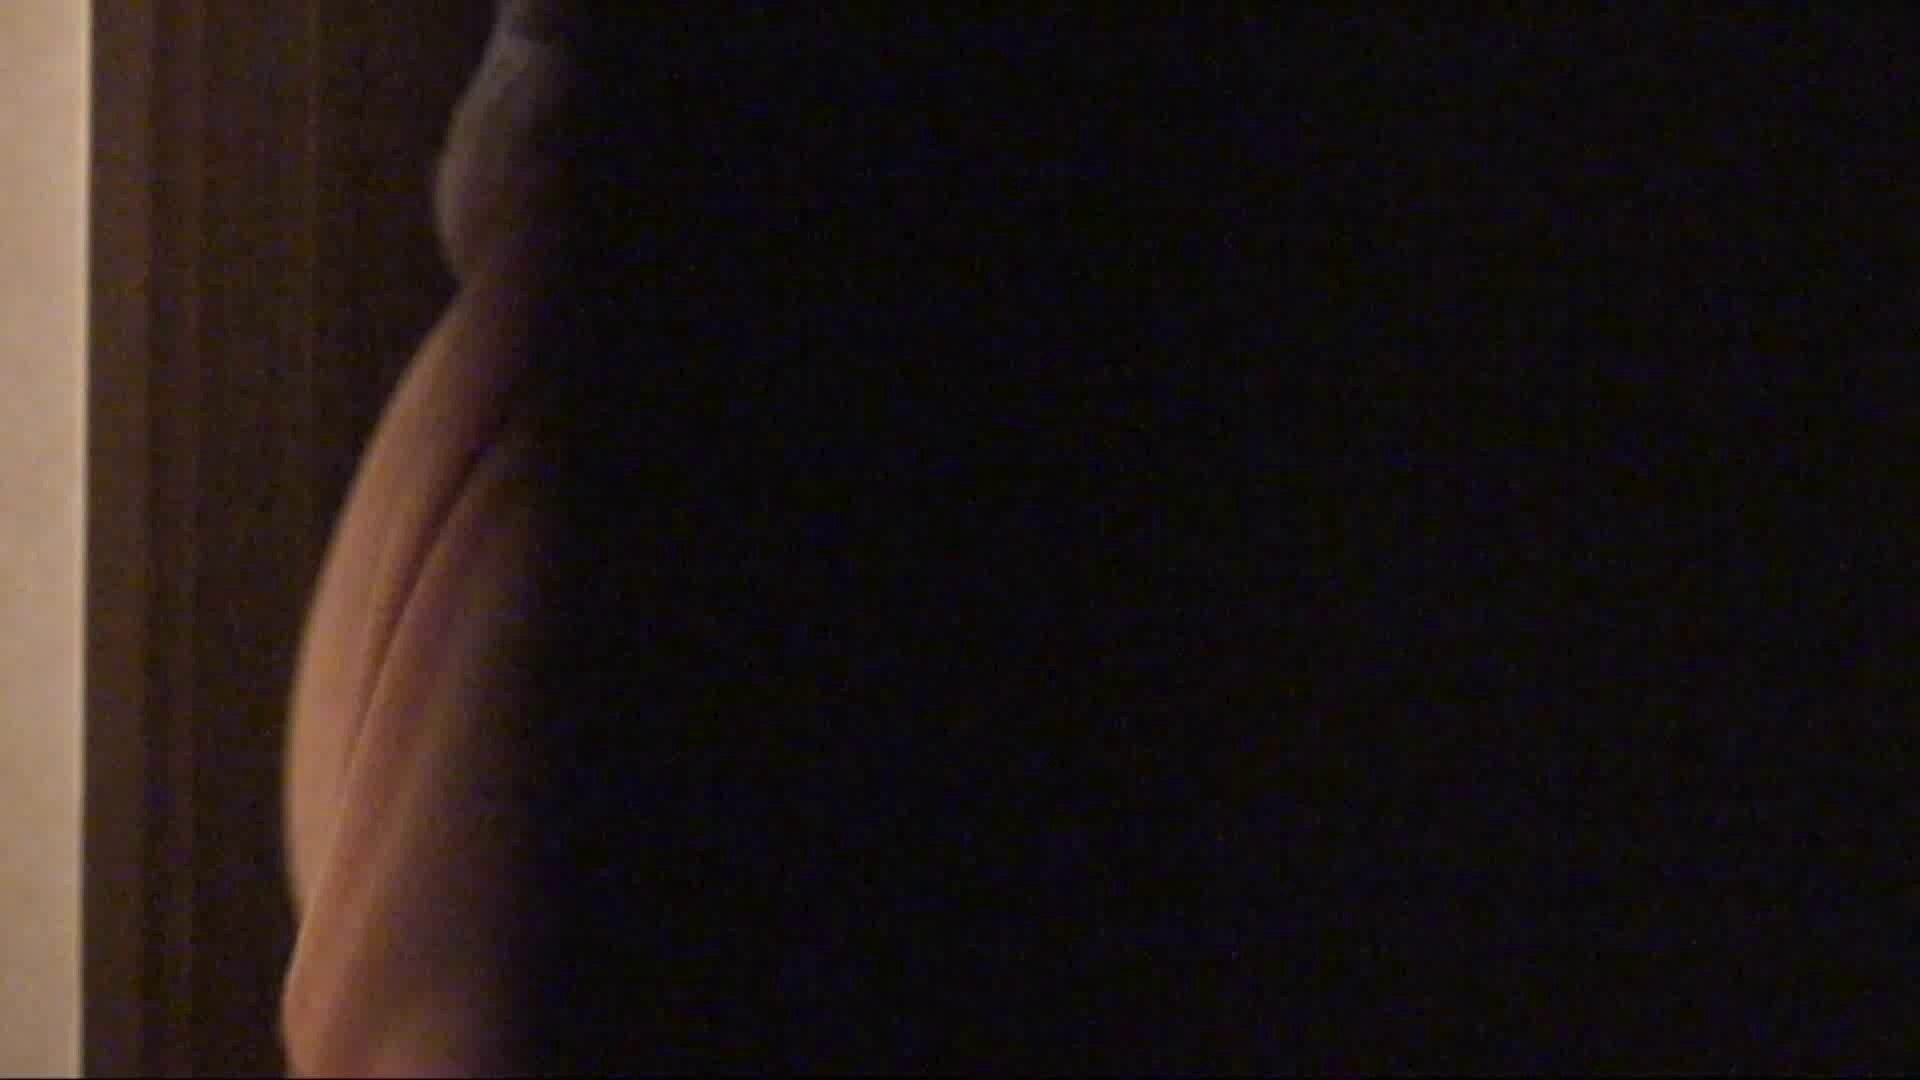 vol.02超可愛すぎる彼女の裸体をハイビジョンで!至近距離での眺め最高! むっちりガール アダルト動画キャプチャ 75枚 18